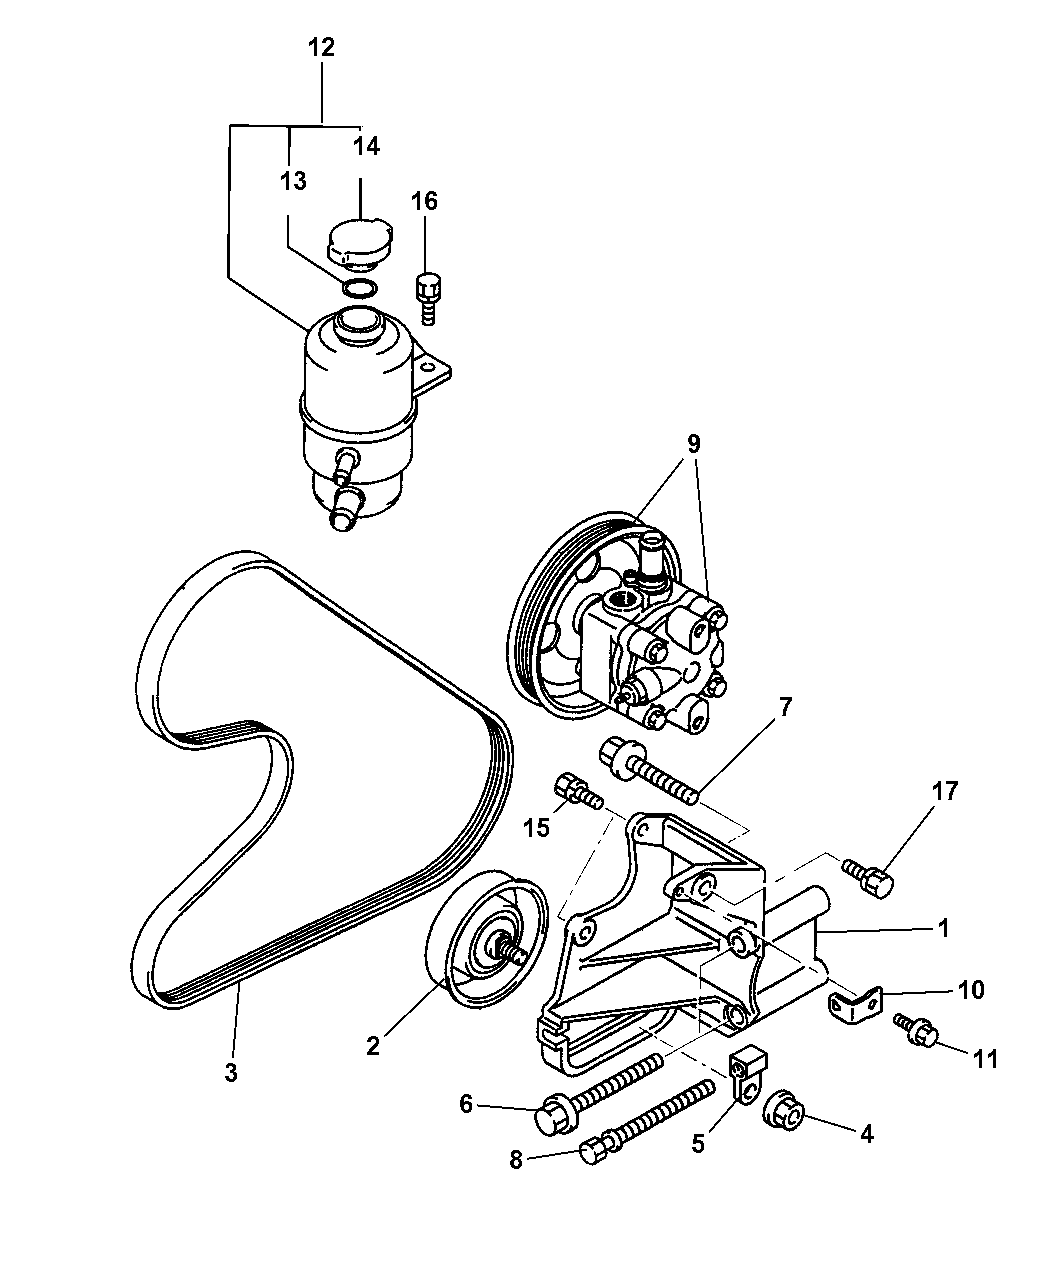 mn101149